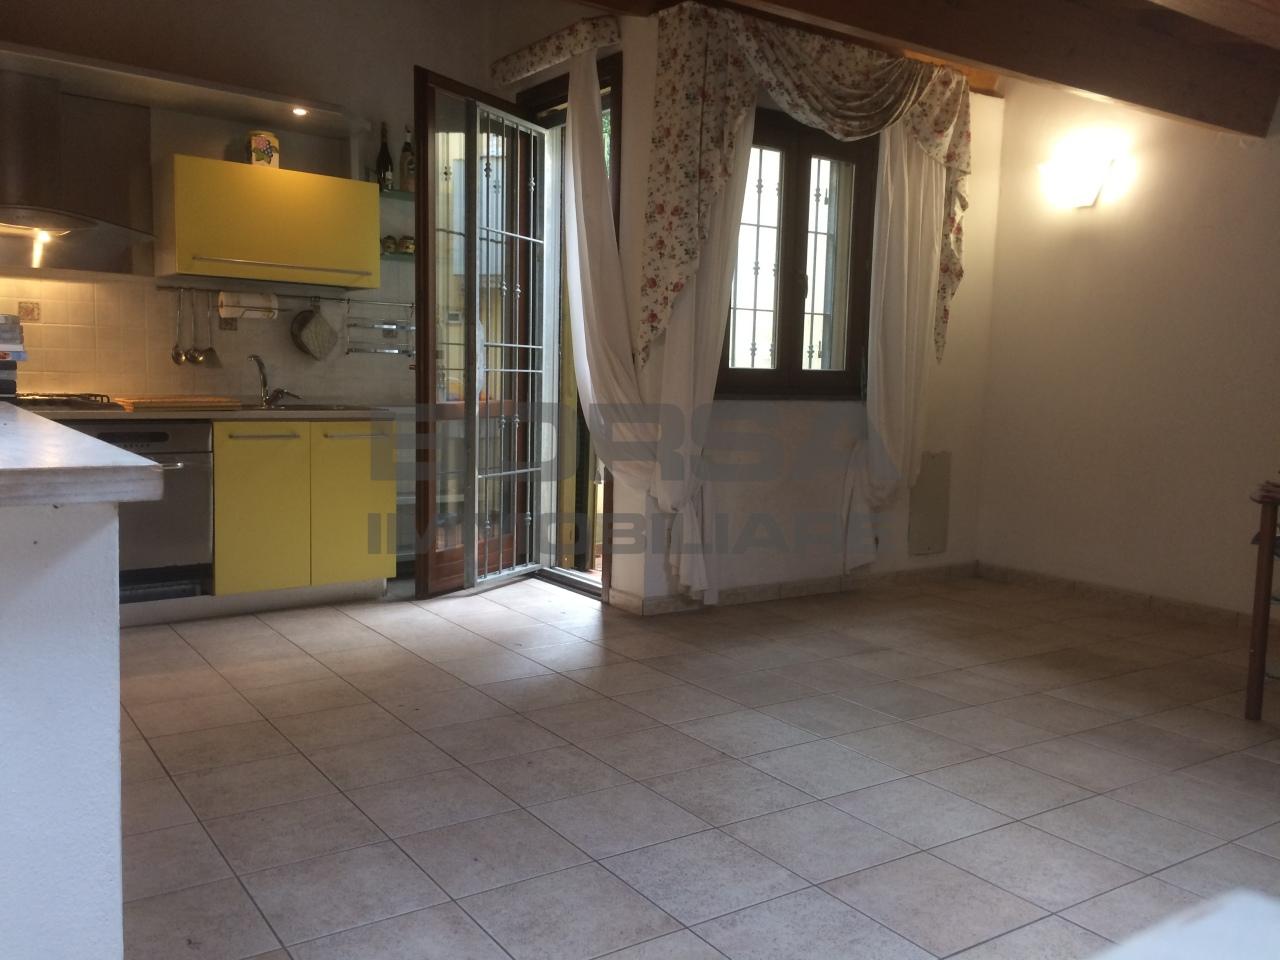 mansarda sottotetto soffitta solaio vendita livorno di metri quadrati 80 prezzo 149000 rif 4219